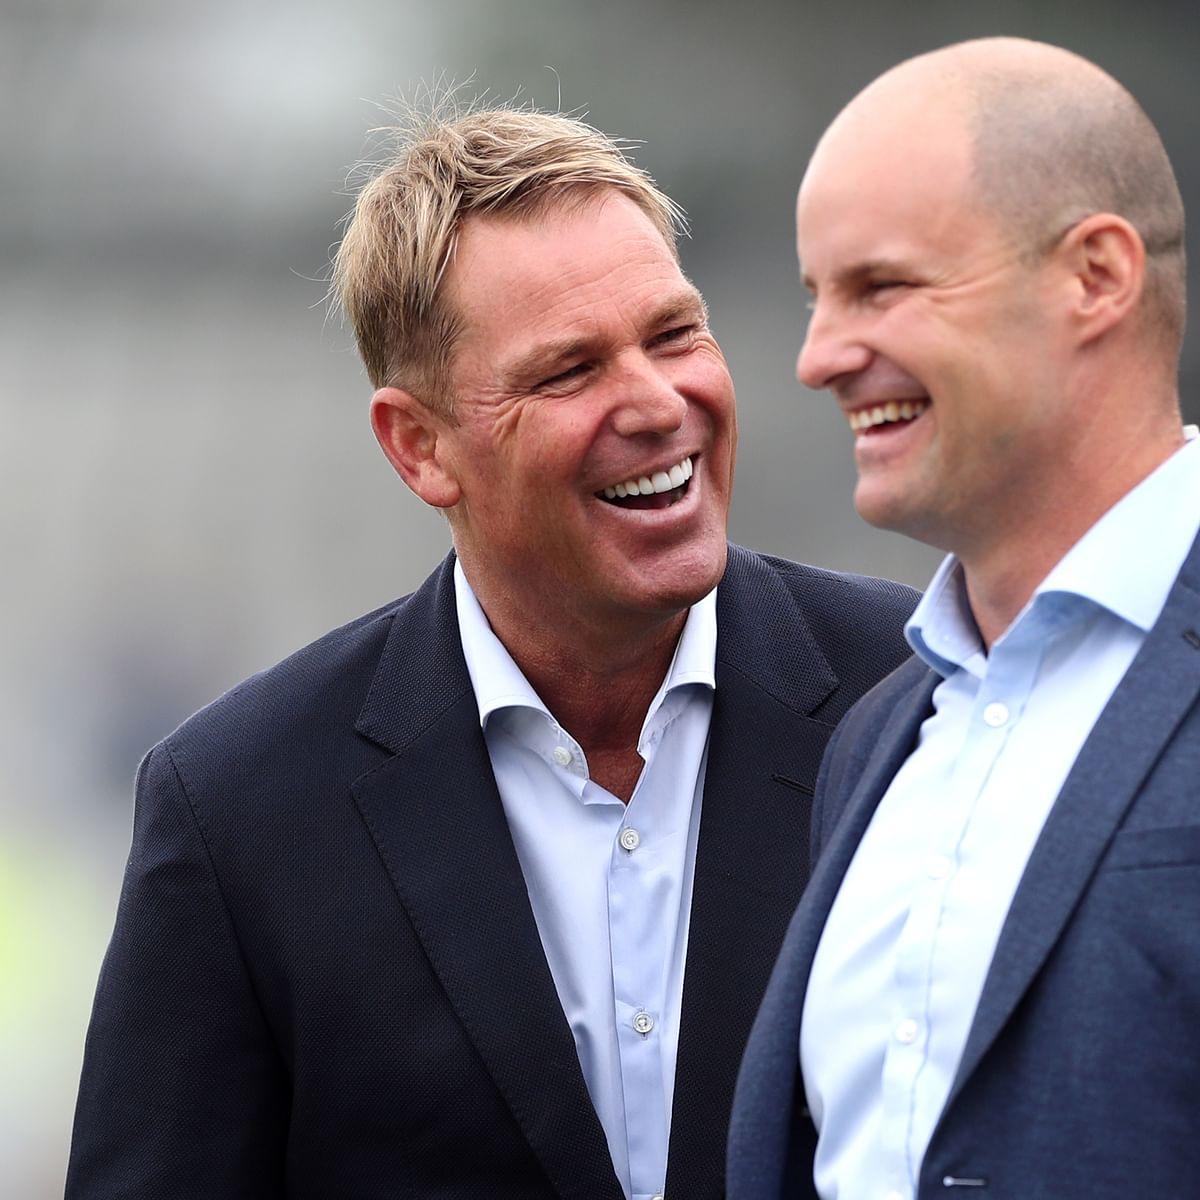 Ind vs England, 1st Test: Shane Warne slams England's mindset, calls their approach 'timid'